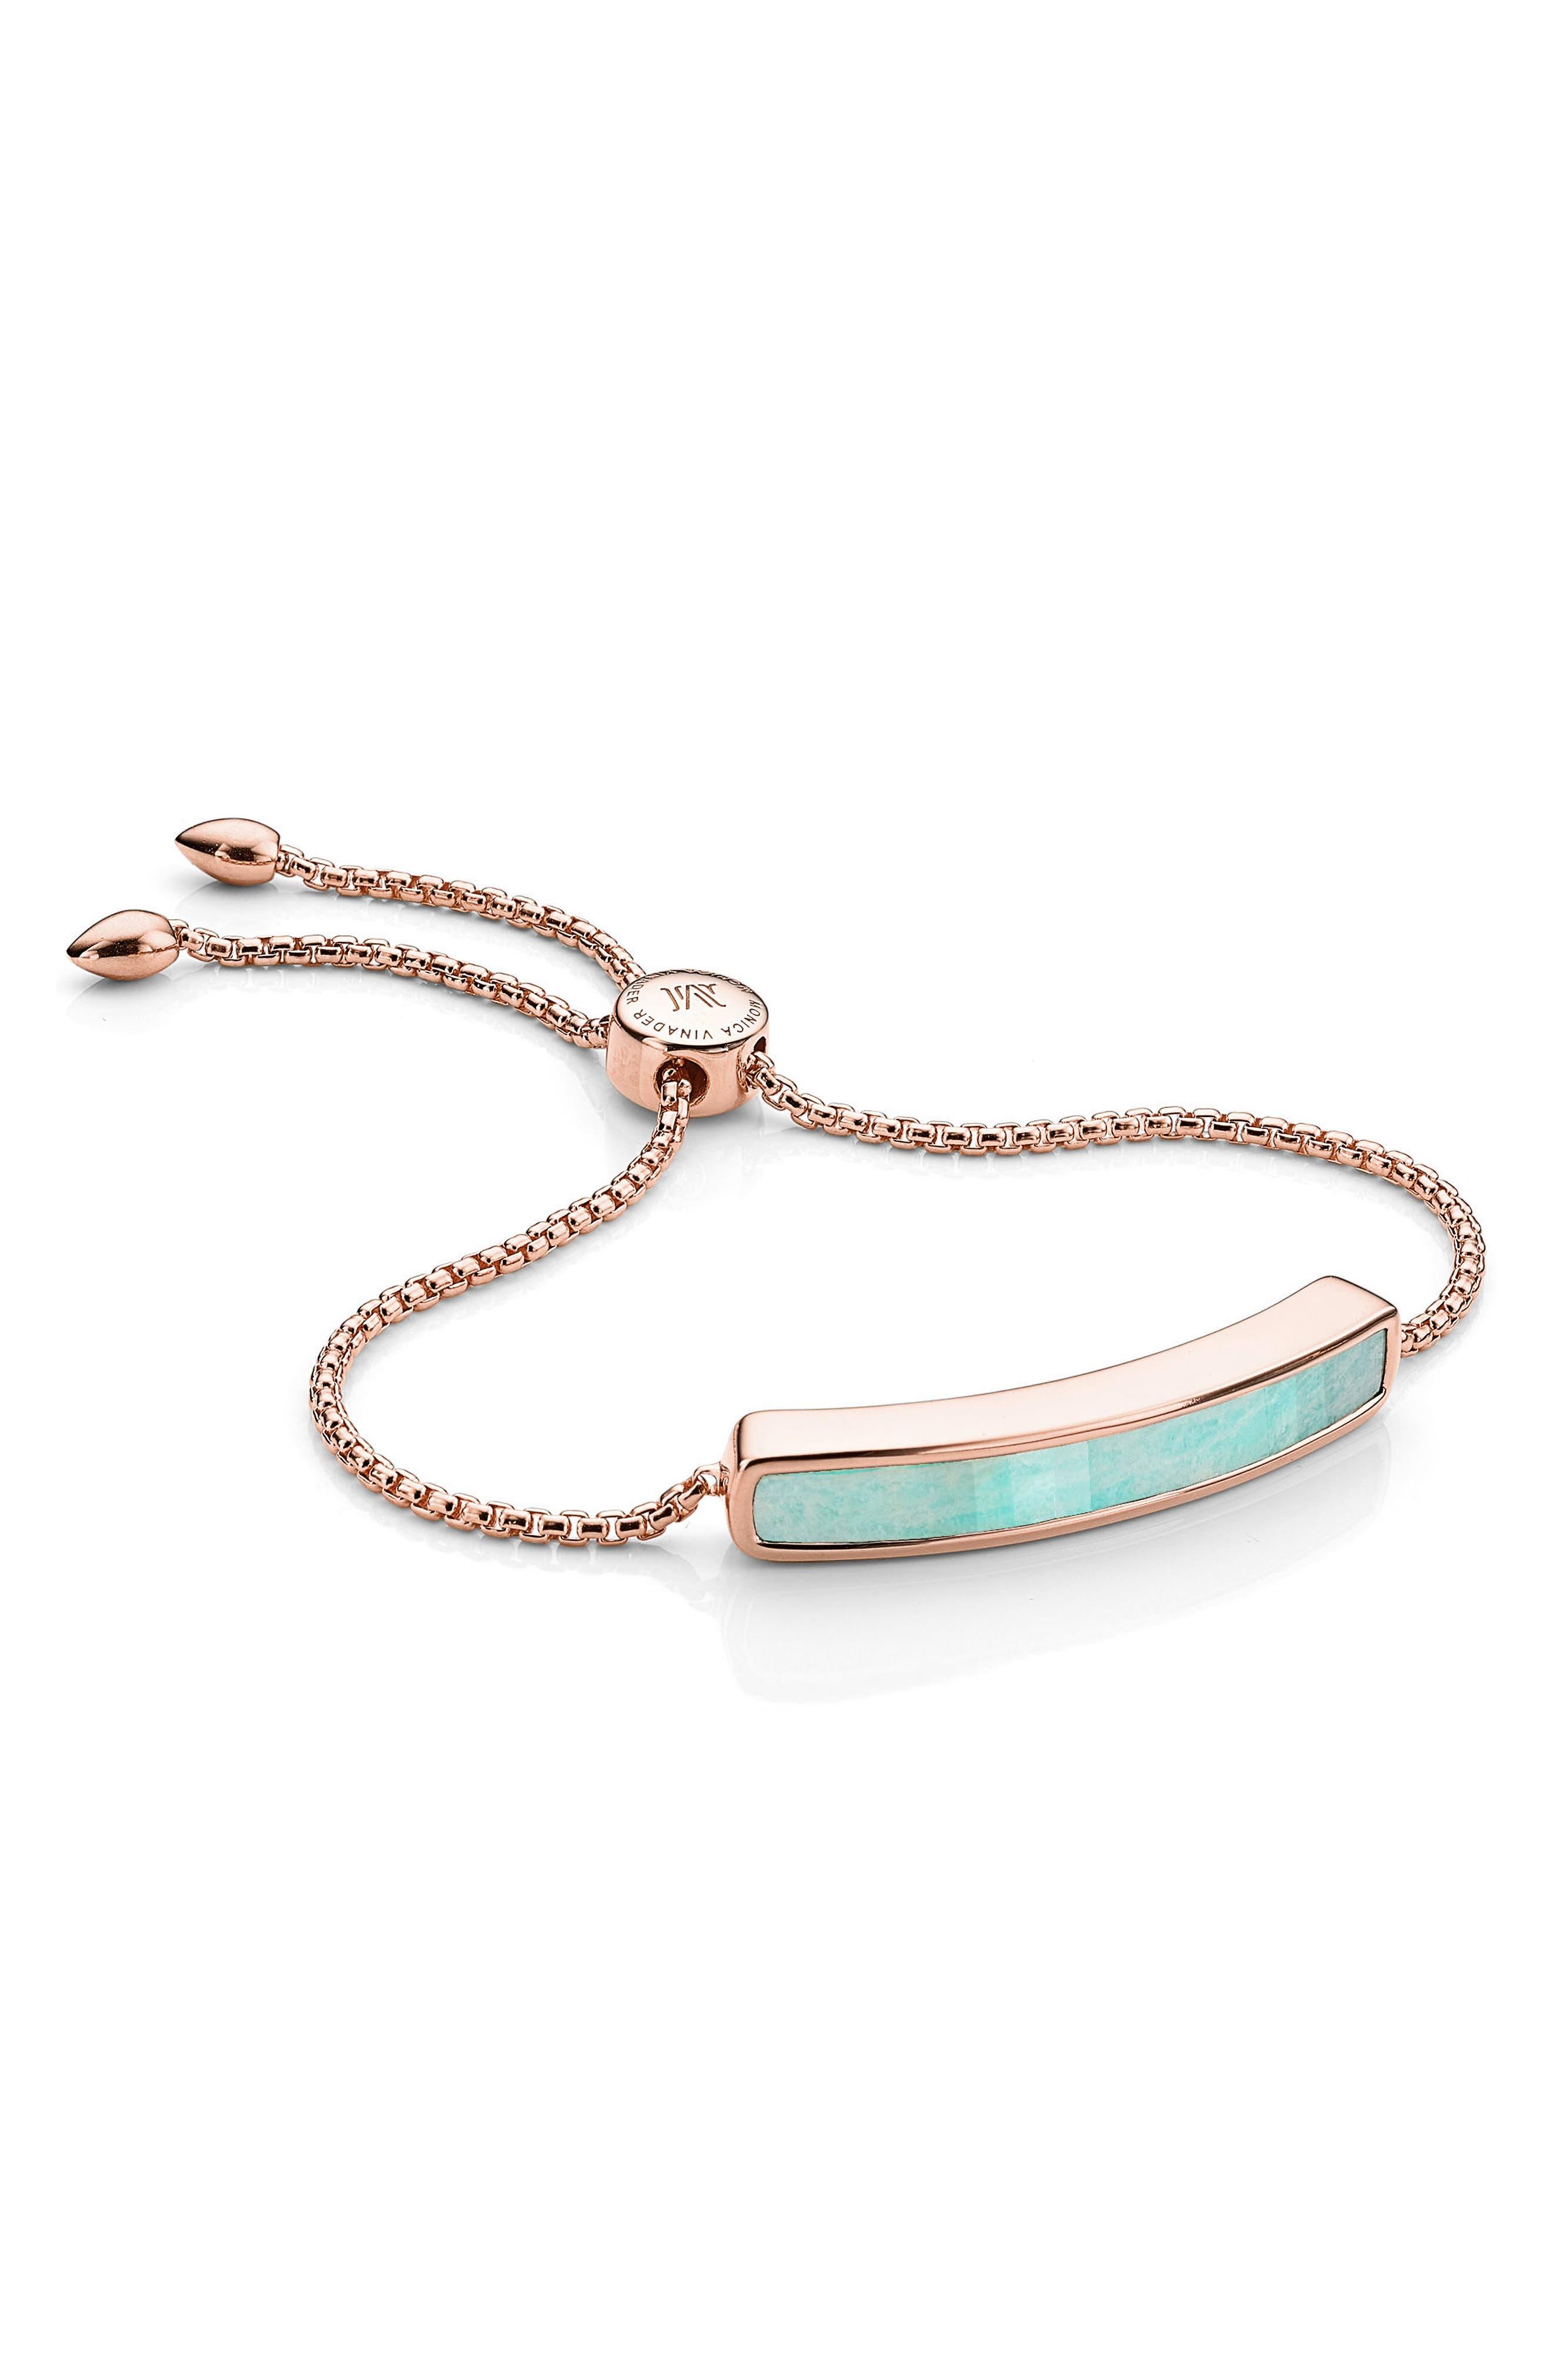 Main Image - Monica Vinader Baja Stone Bracelet